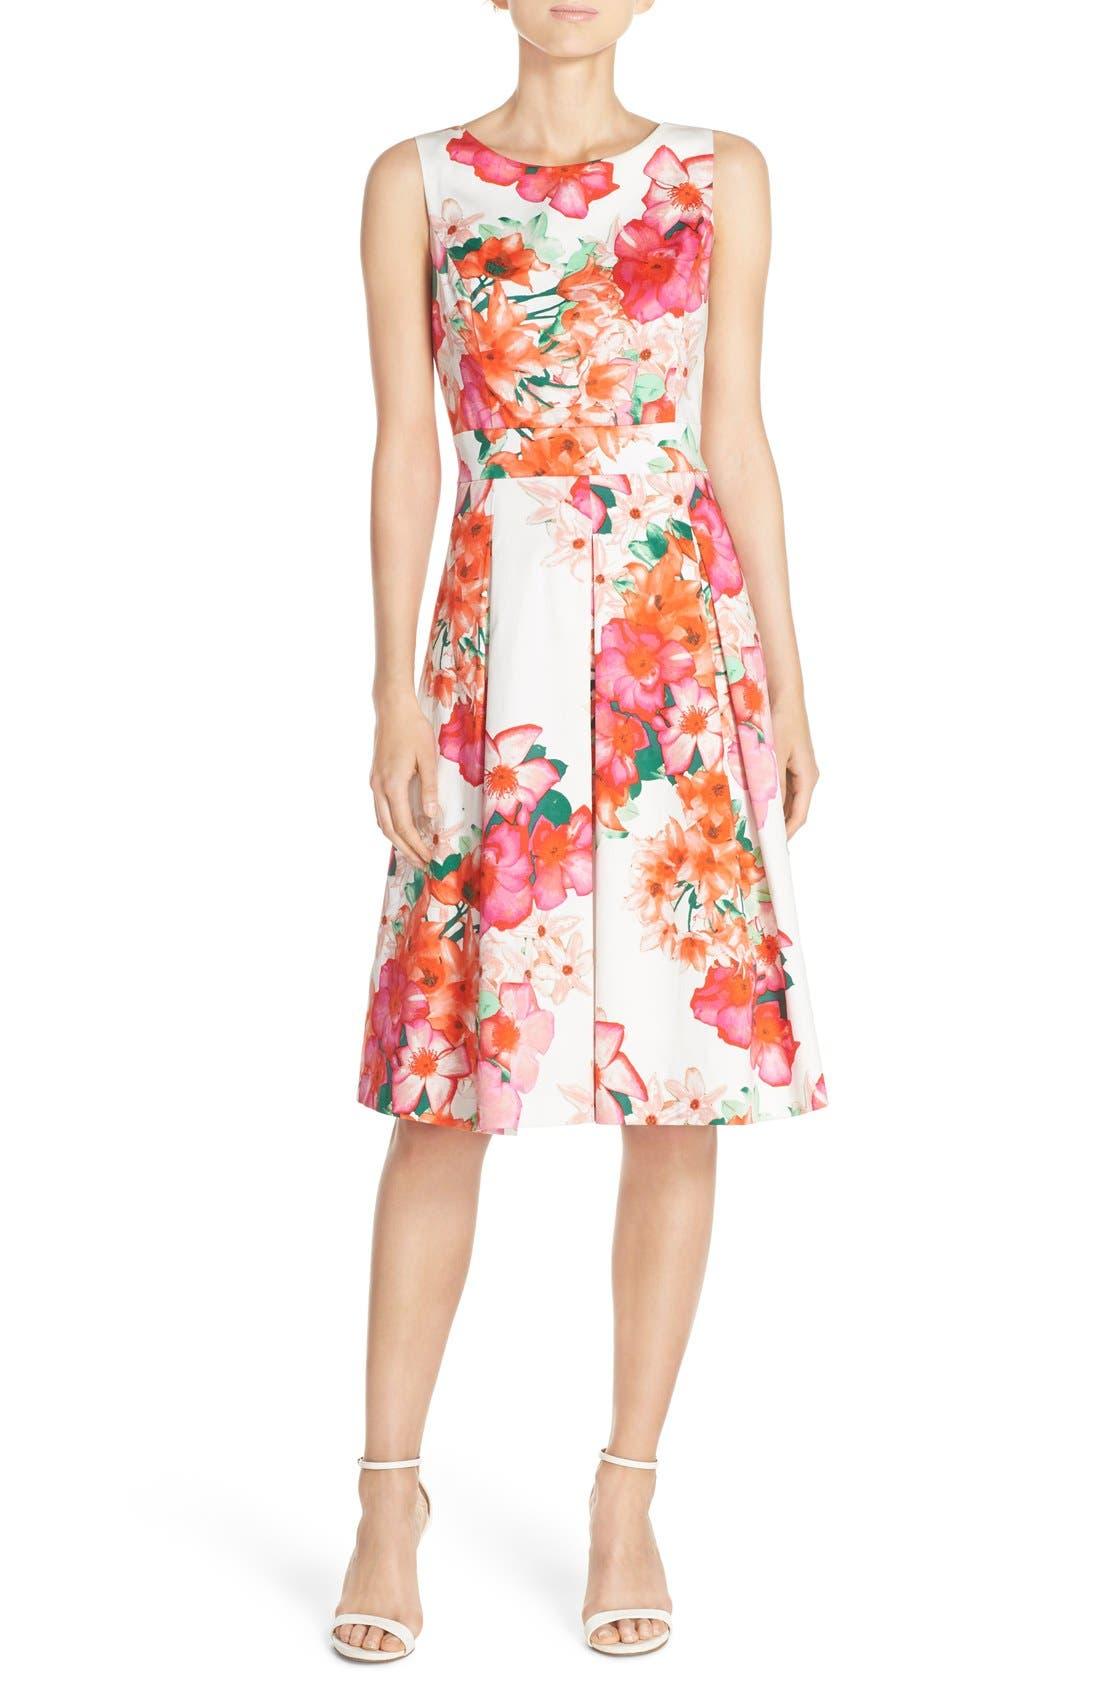 Floral Print Fit & Flare Dress,                             Main thumbnail 1, color,                             Pink/ Orange/ Green